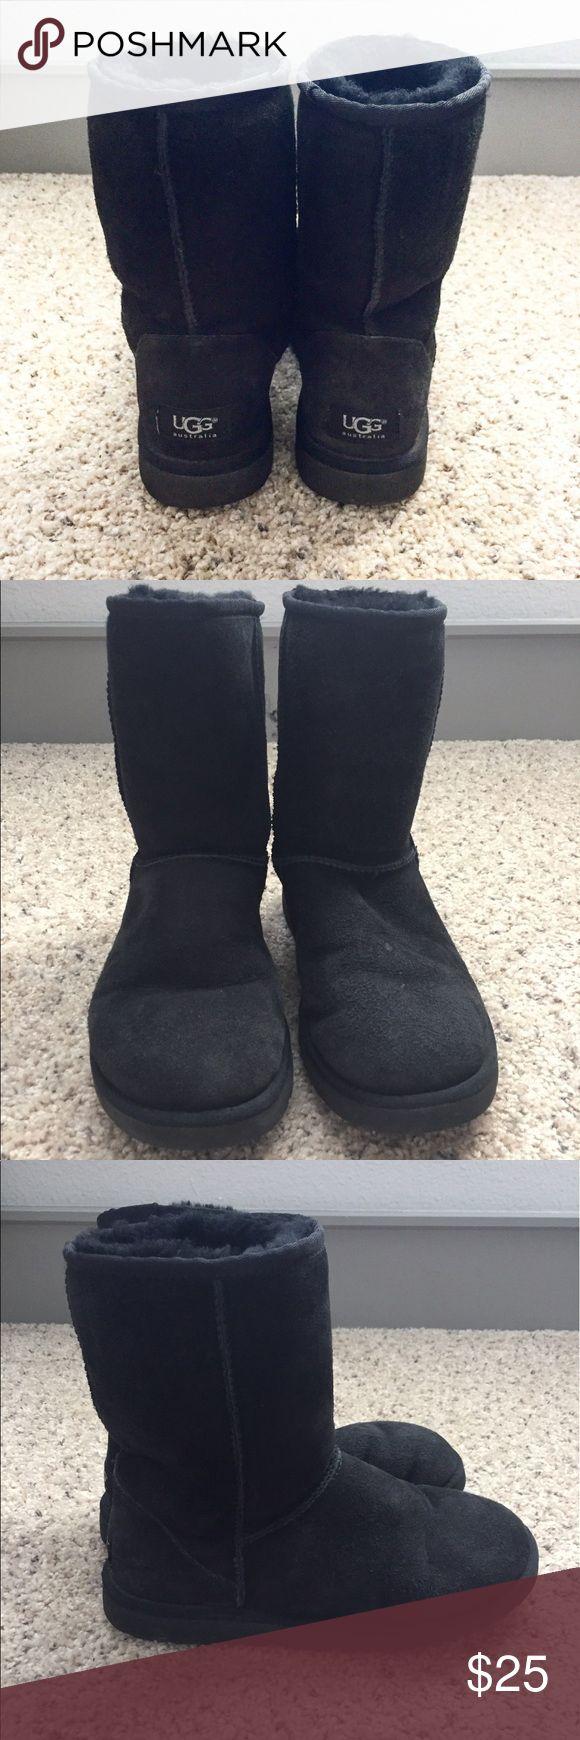 UGG Classic Short (Black) Lightly Worn UGG Classic Short (Black) UGG Shoes Winter & Rain Boots